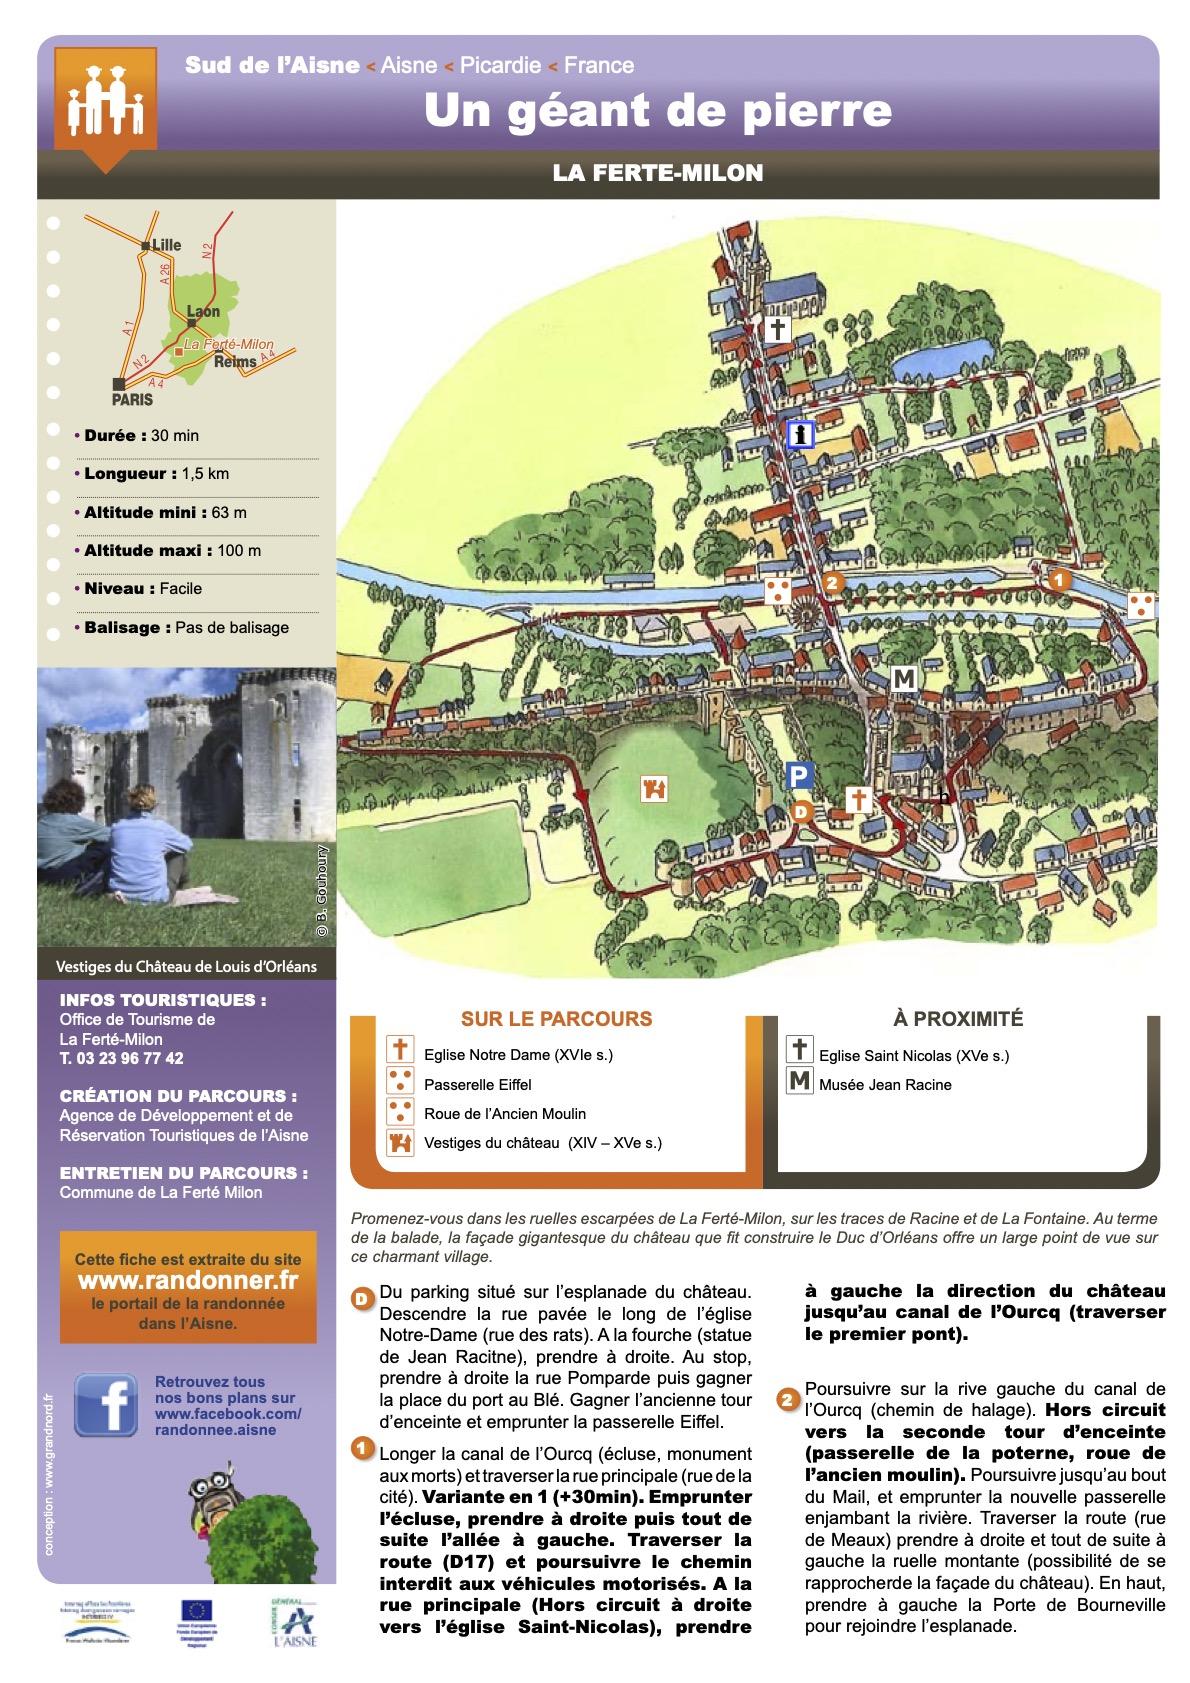 Un-geant-de-pierre-microbalade-La-Ferte-Milon-Aisne-Picardie-4.jpg